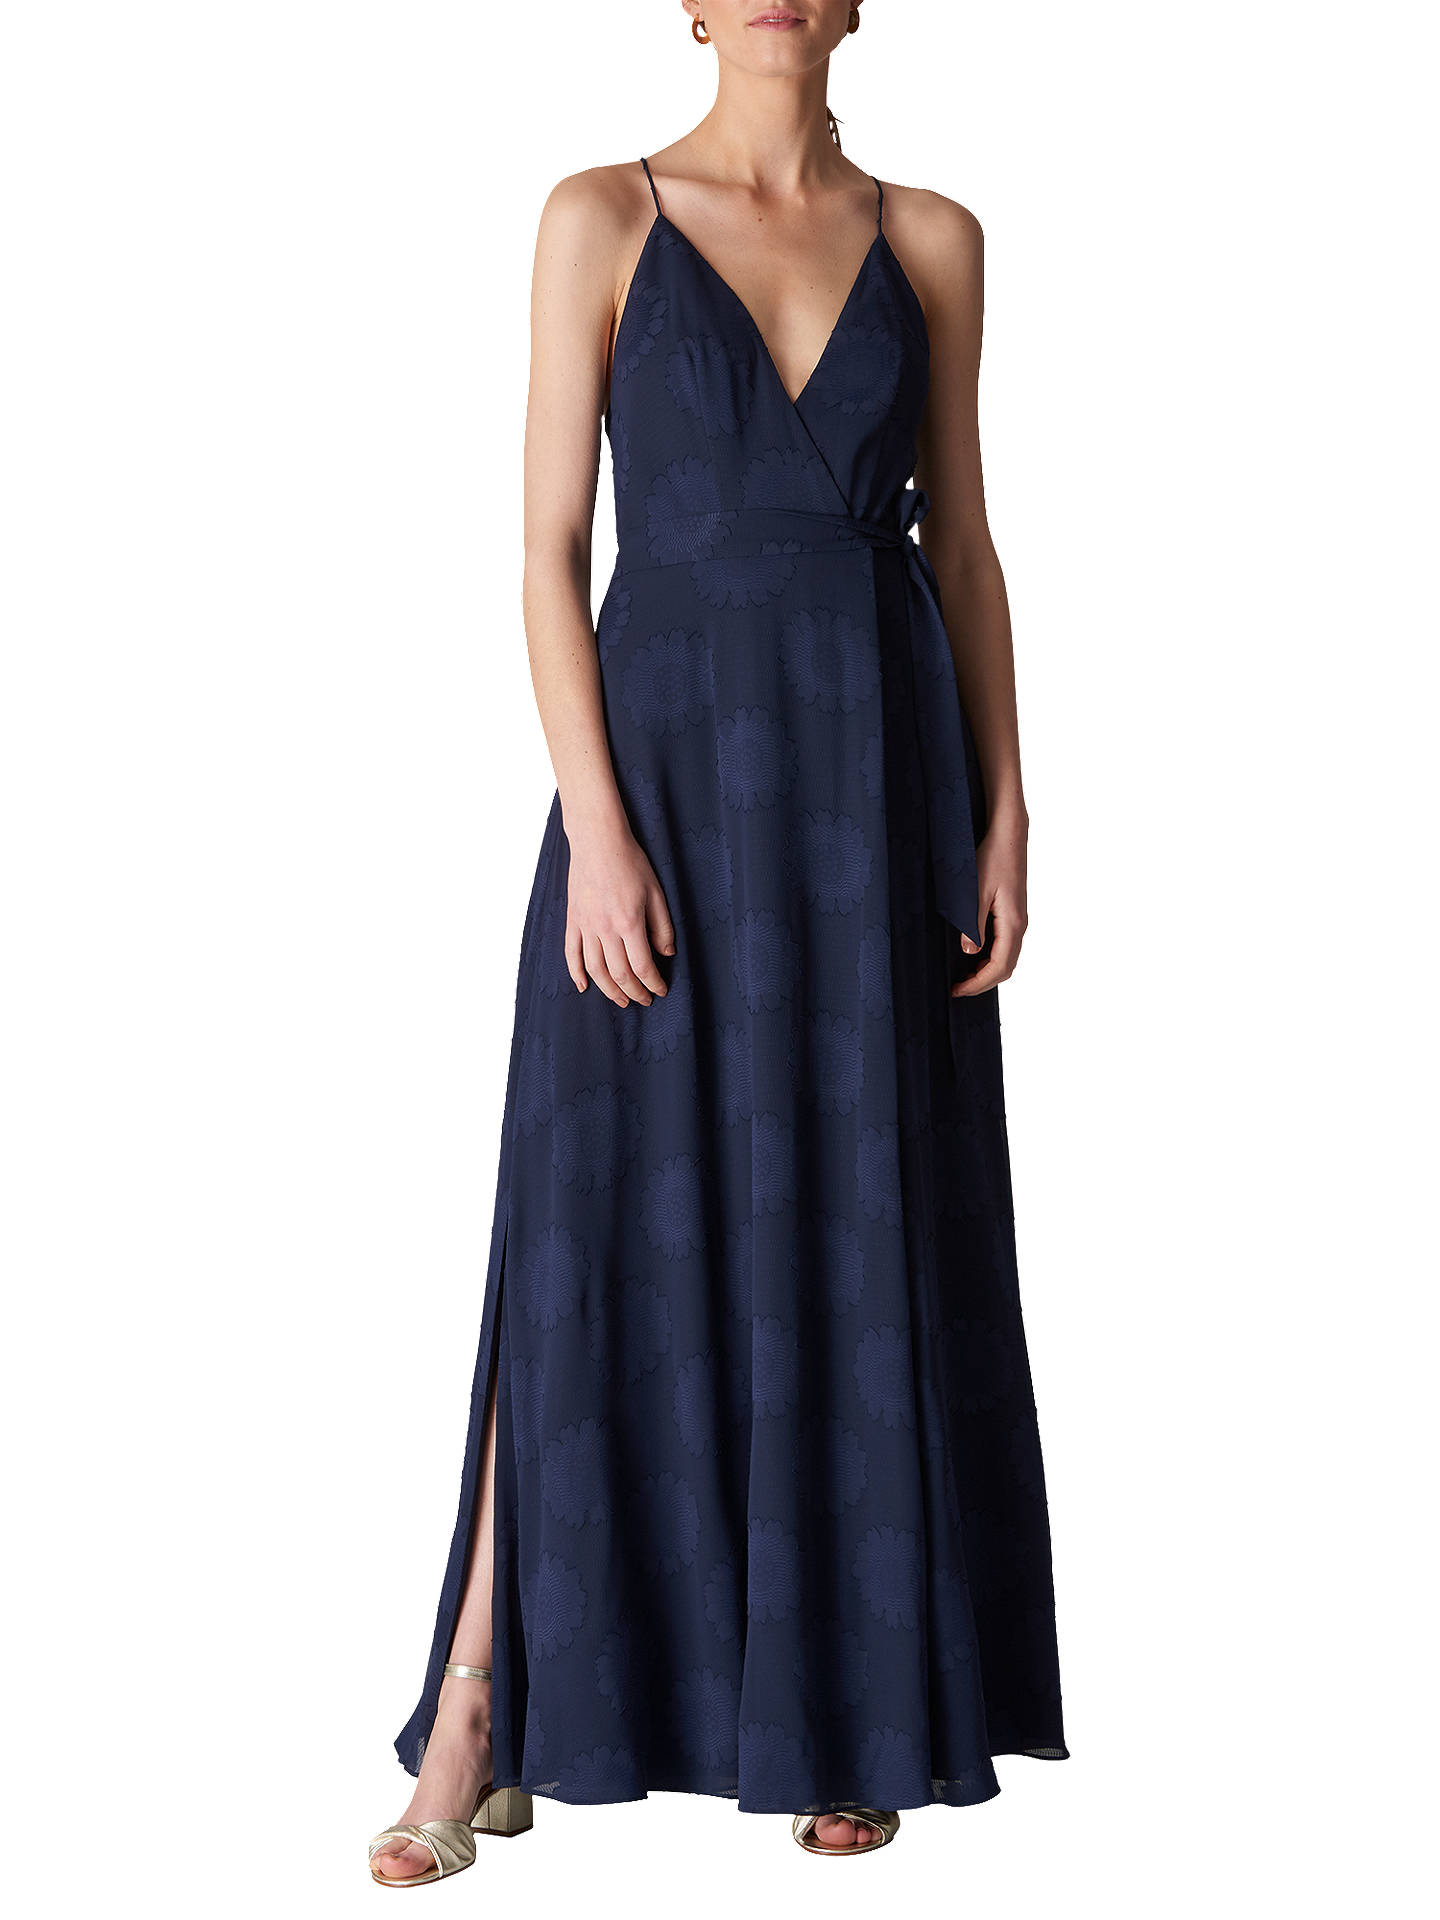 bcf88803ebdcf Whistles Noa Jacquard Maxi Dress at John Lewis & Partners